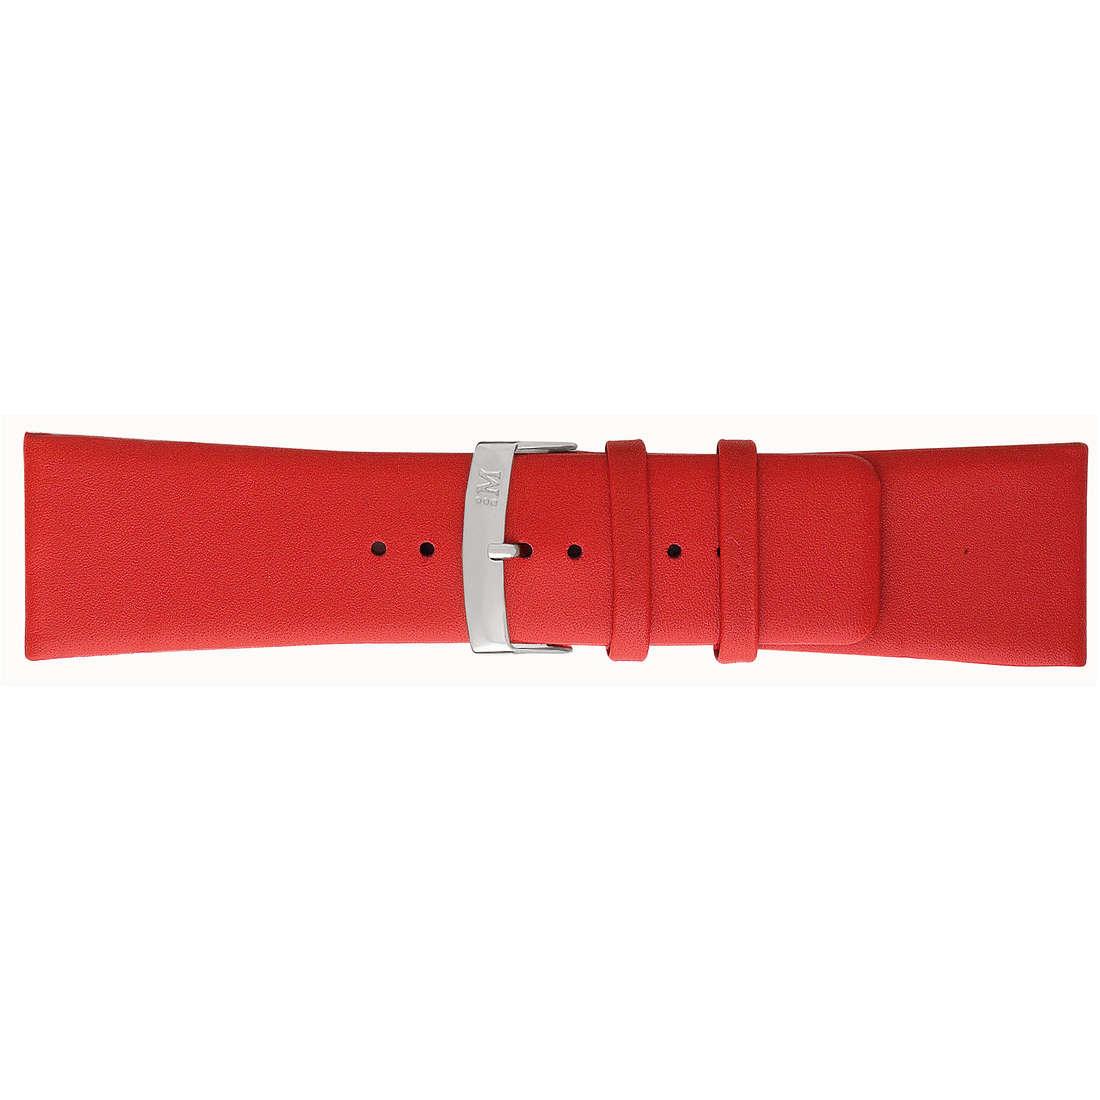 watch watch bands watch straps man Morellato Morellato 1930 A01X3076875083CR18